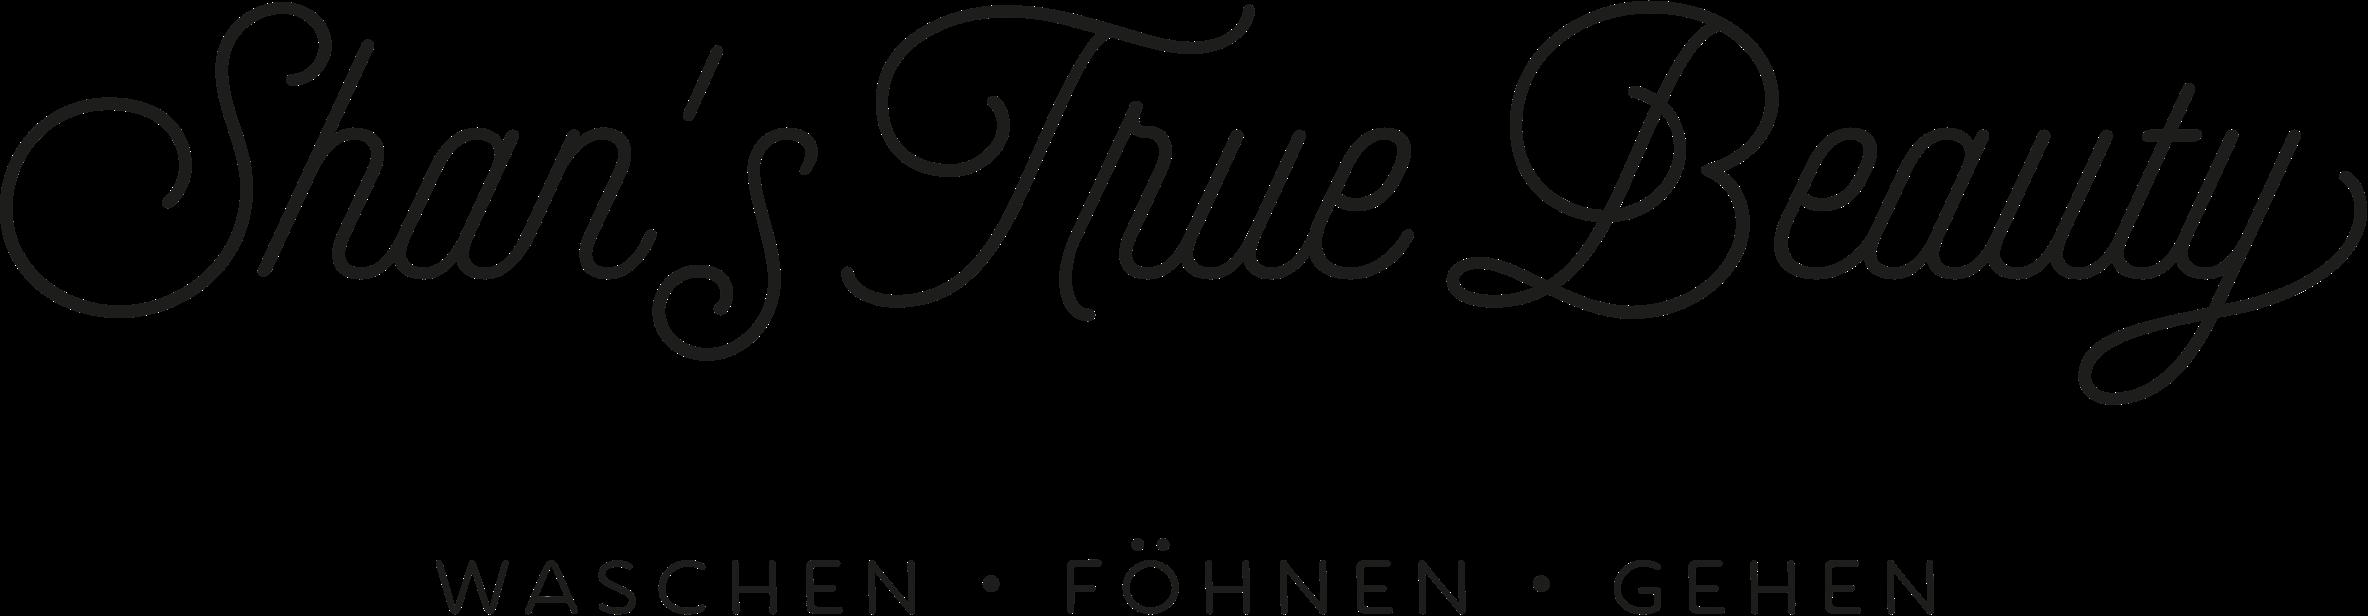 shans-true-beauty_logo.png